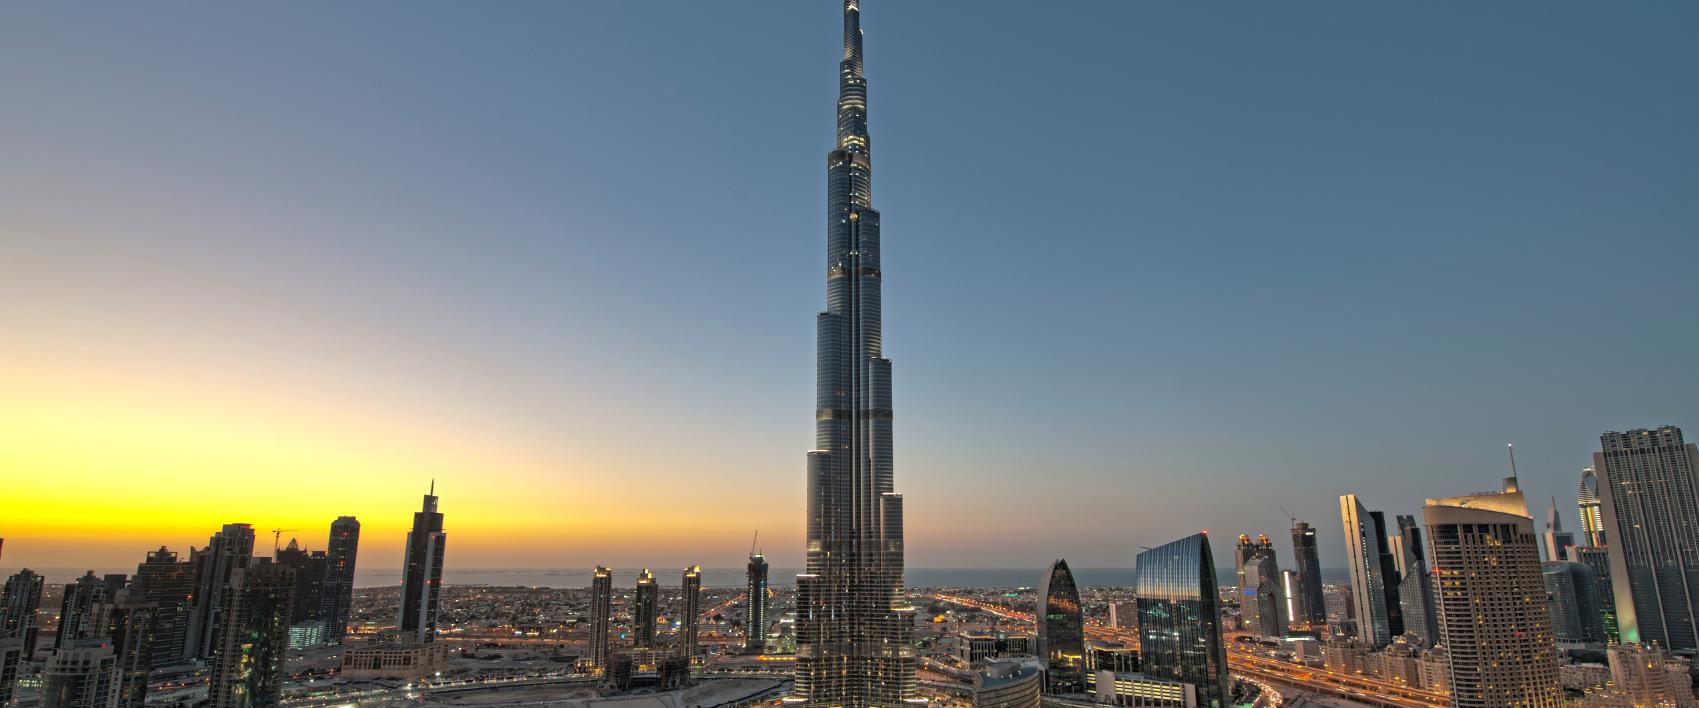 Burj Khalifa - BESIX